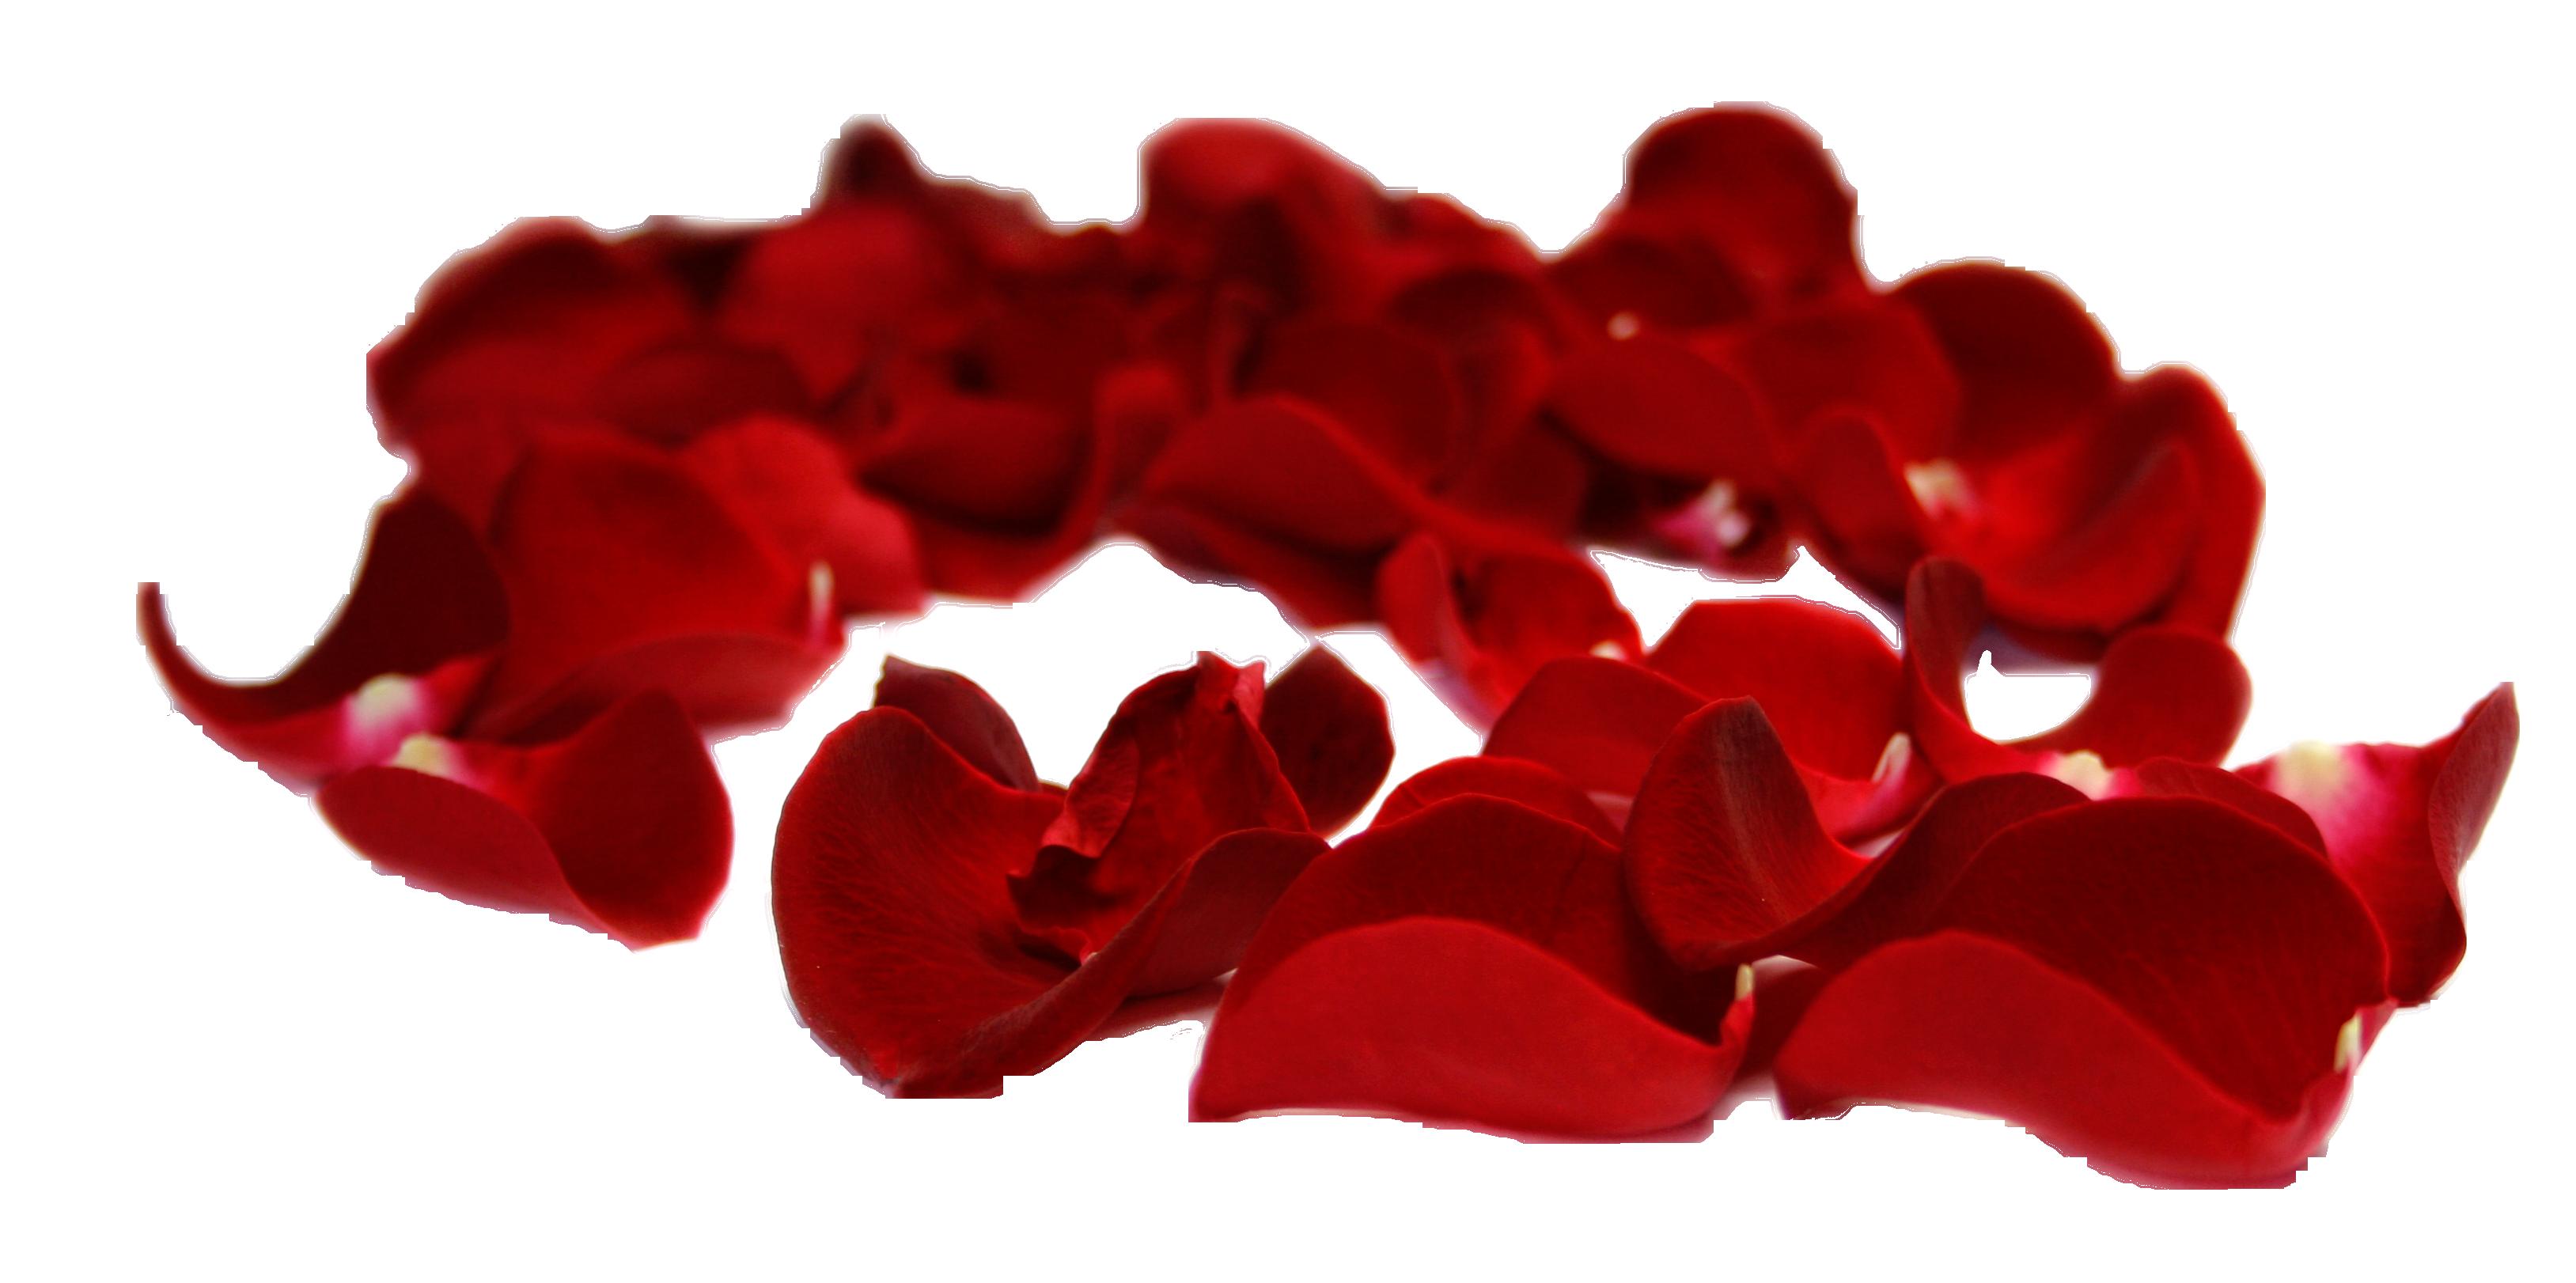 Flower petal clipart clip art free library Petal Rose Clip art - petal 3256*1622 transprent Png Free Download ... clip art free library